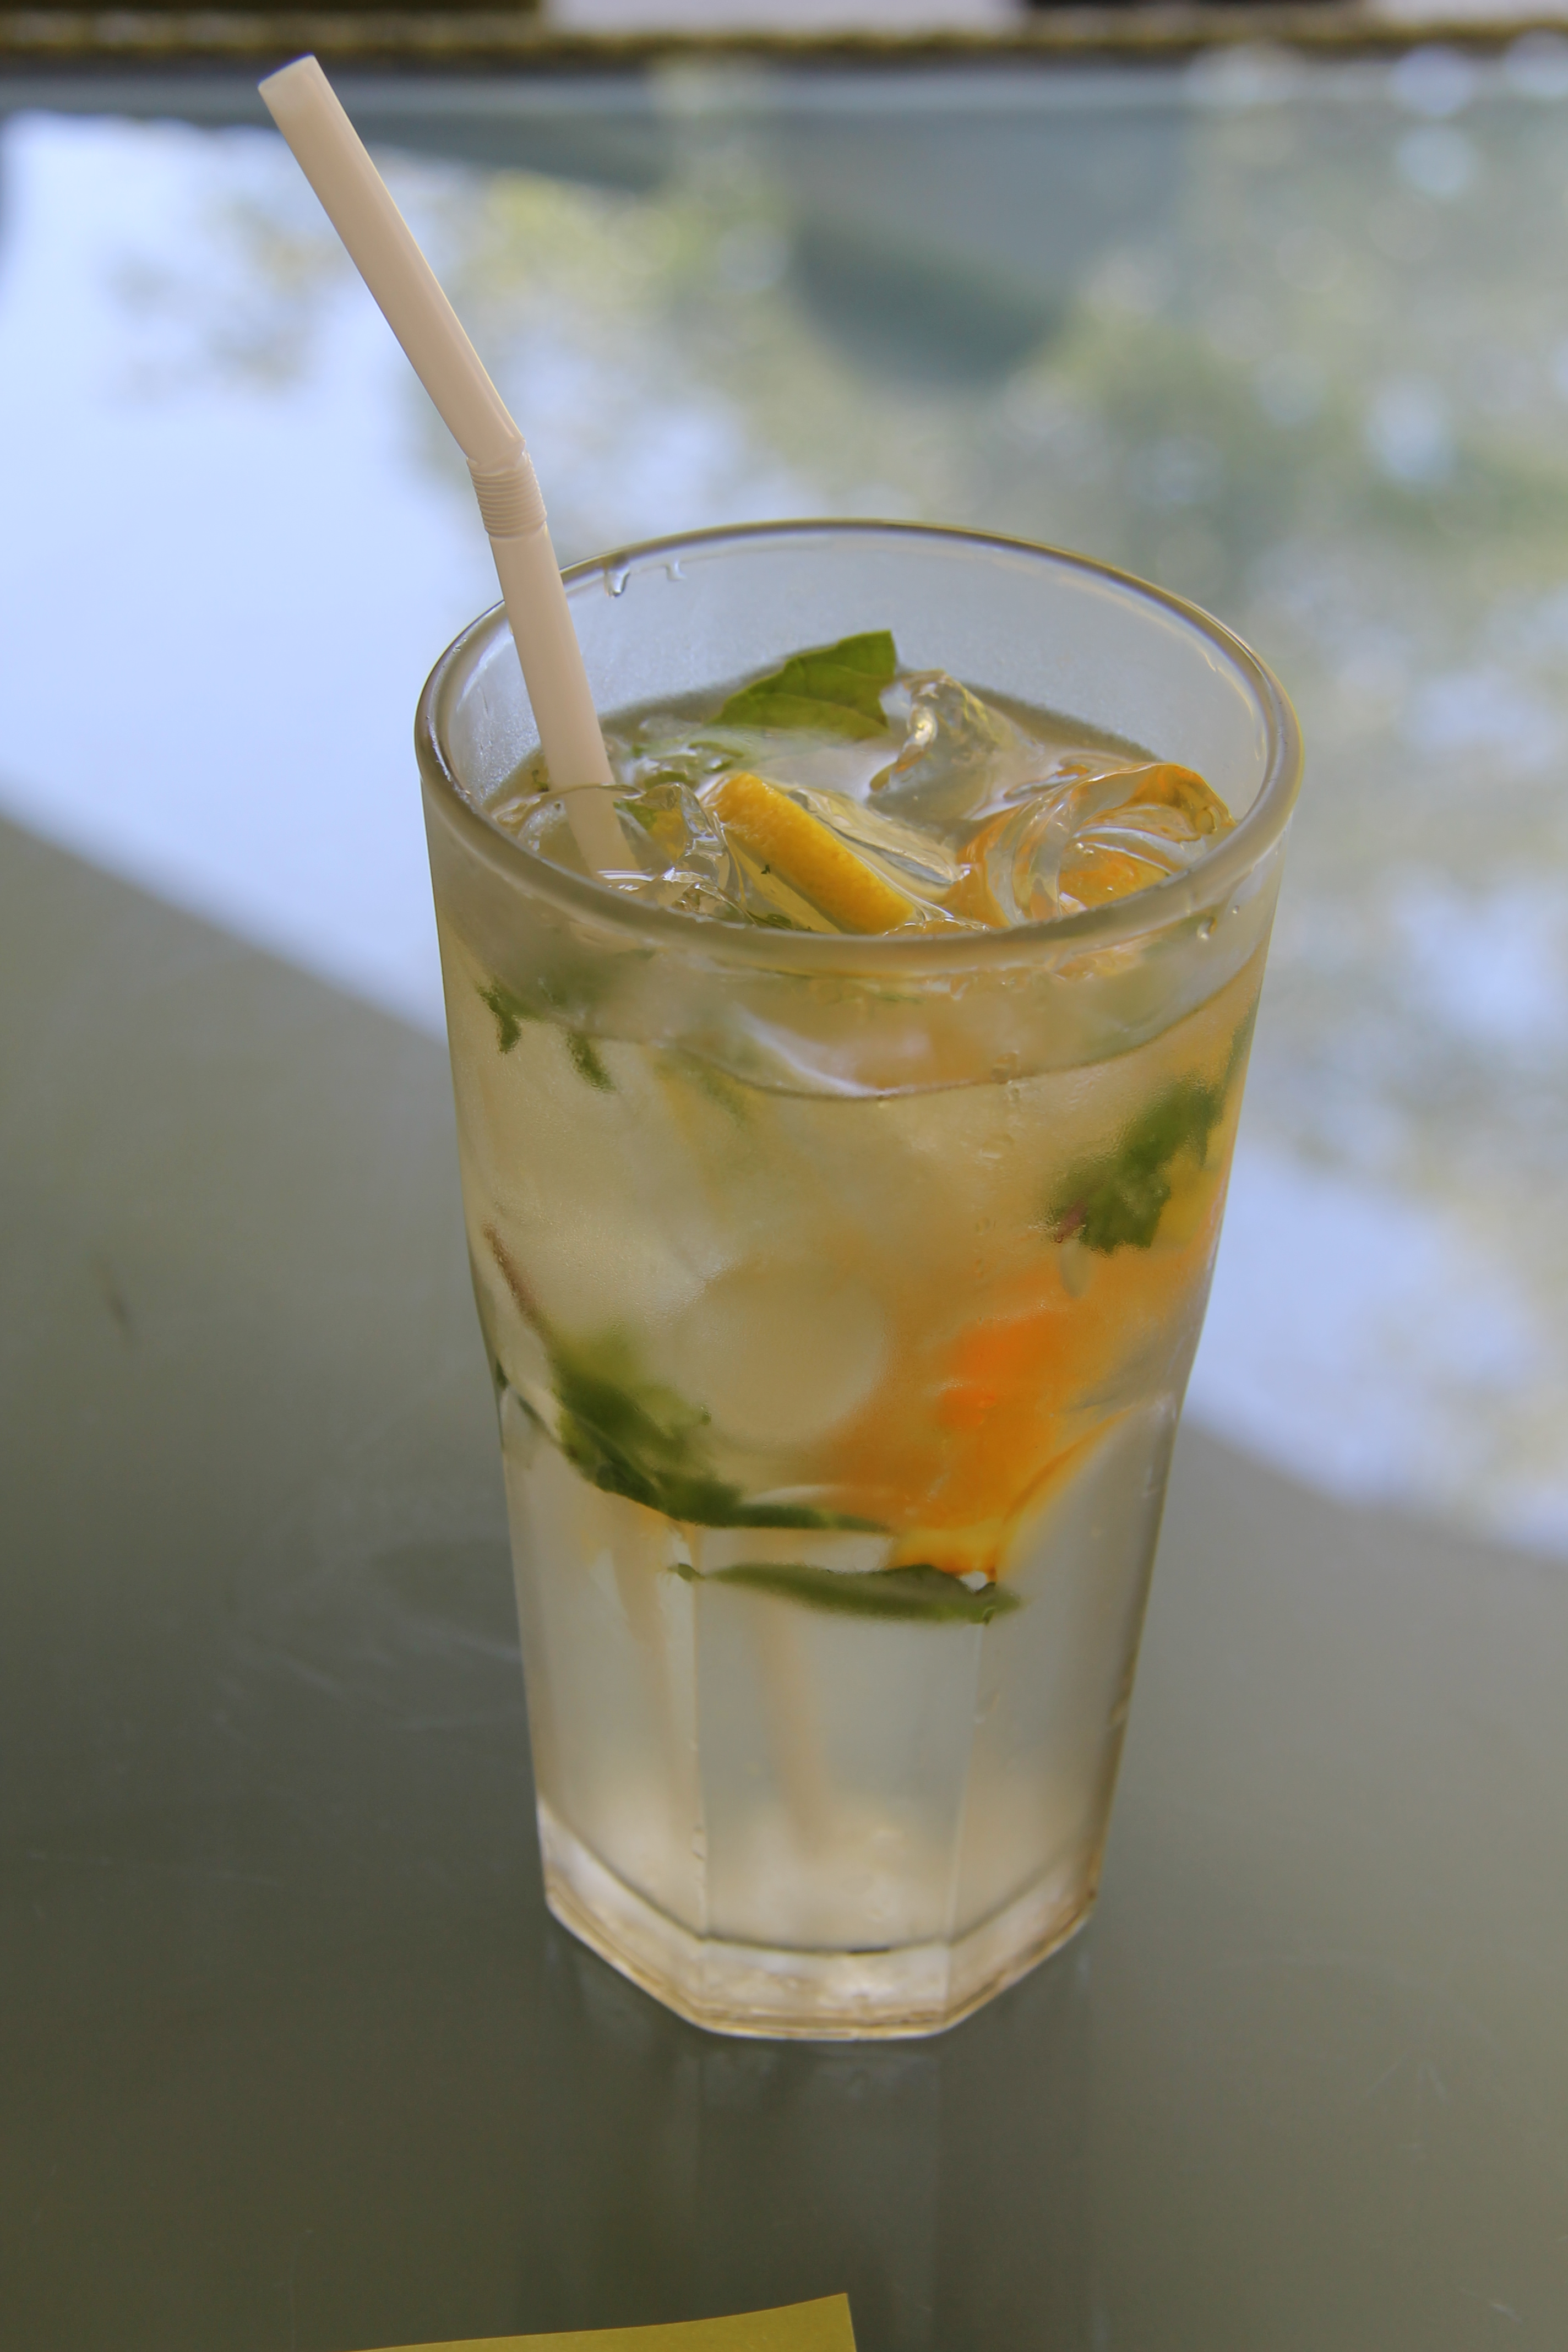 Cucumber-Basil Lemonade With Lemongrass Recipes — Dishmaps